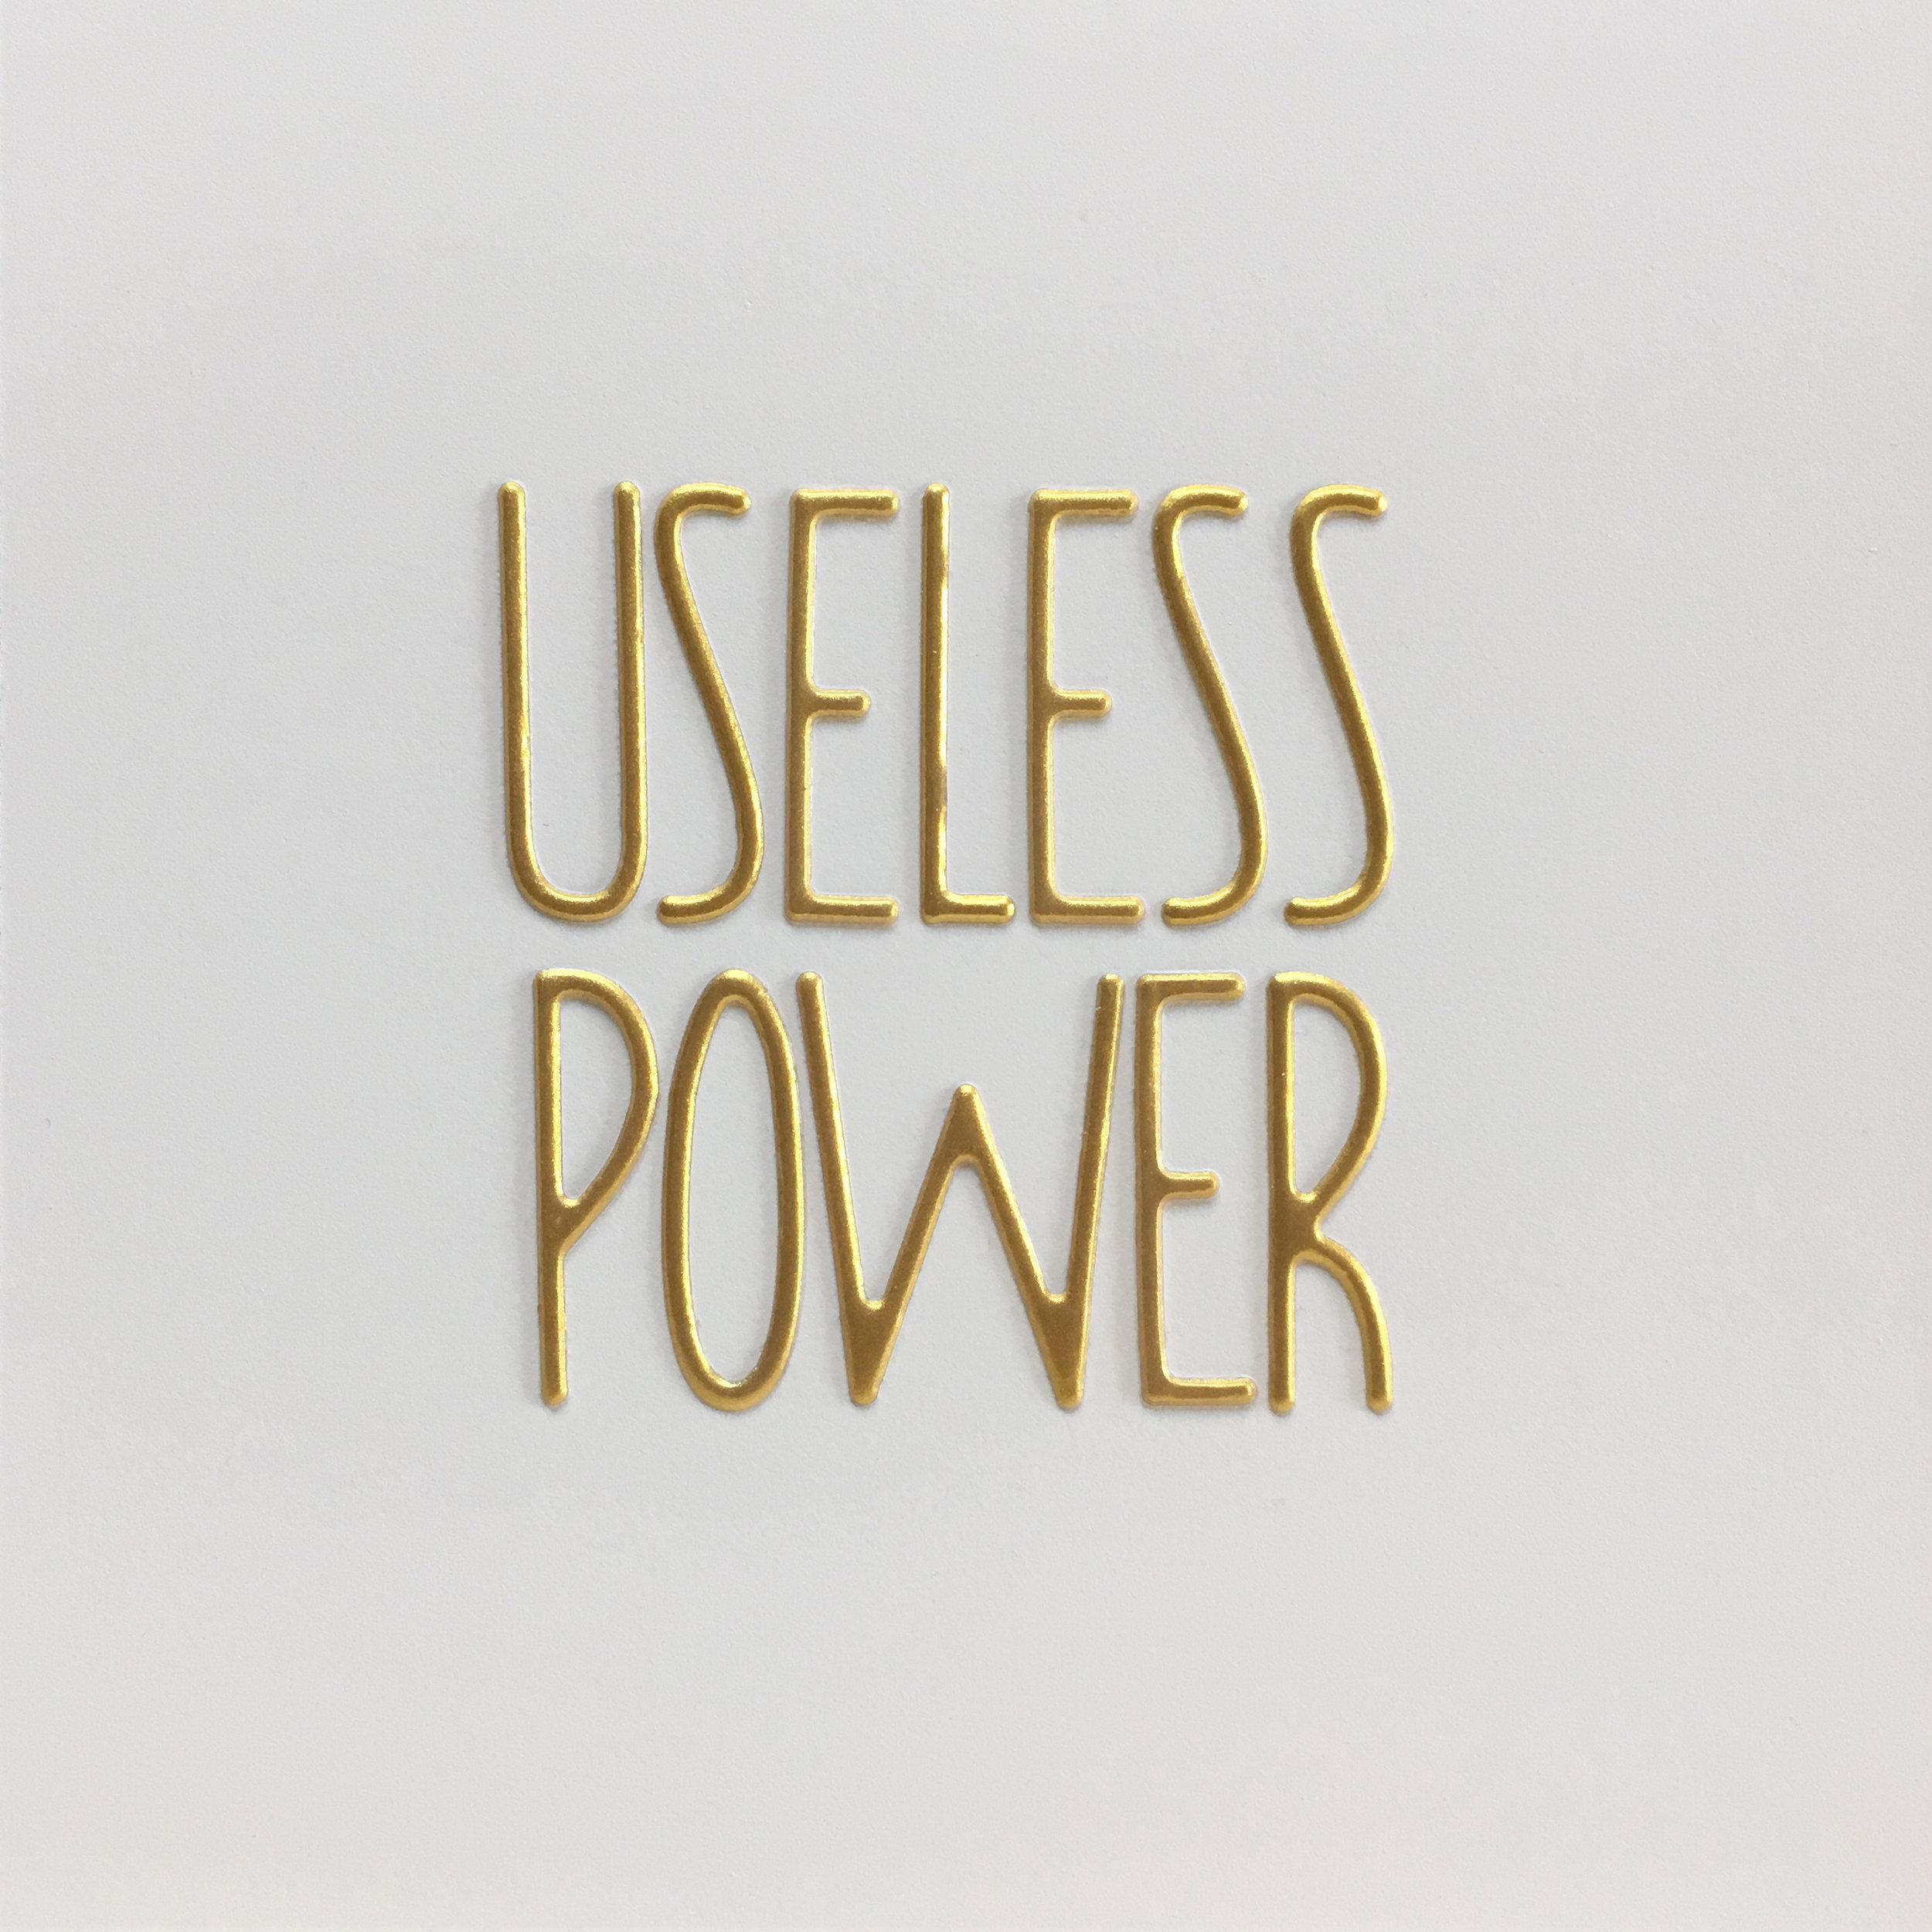 useless power.jpg